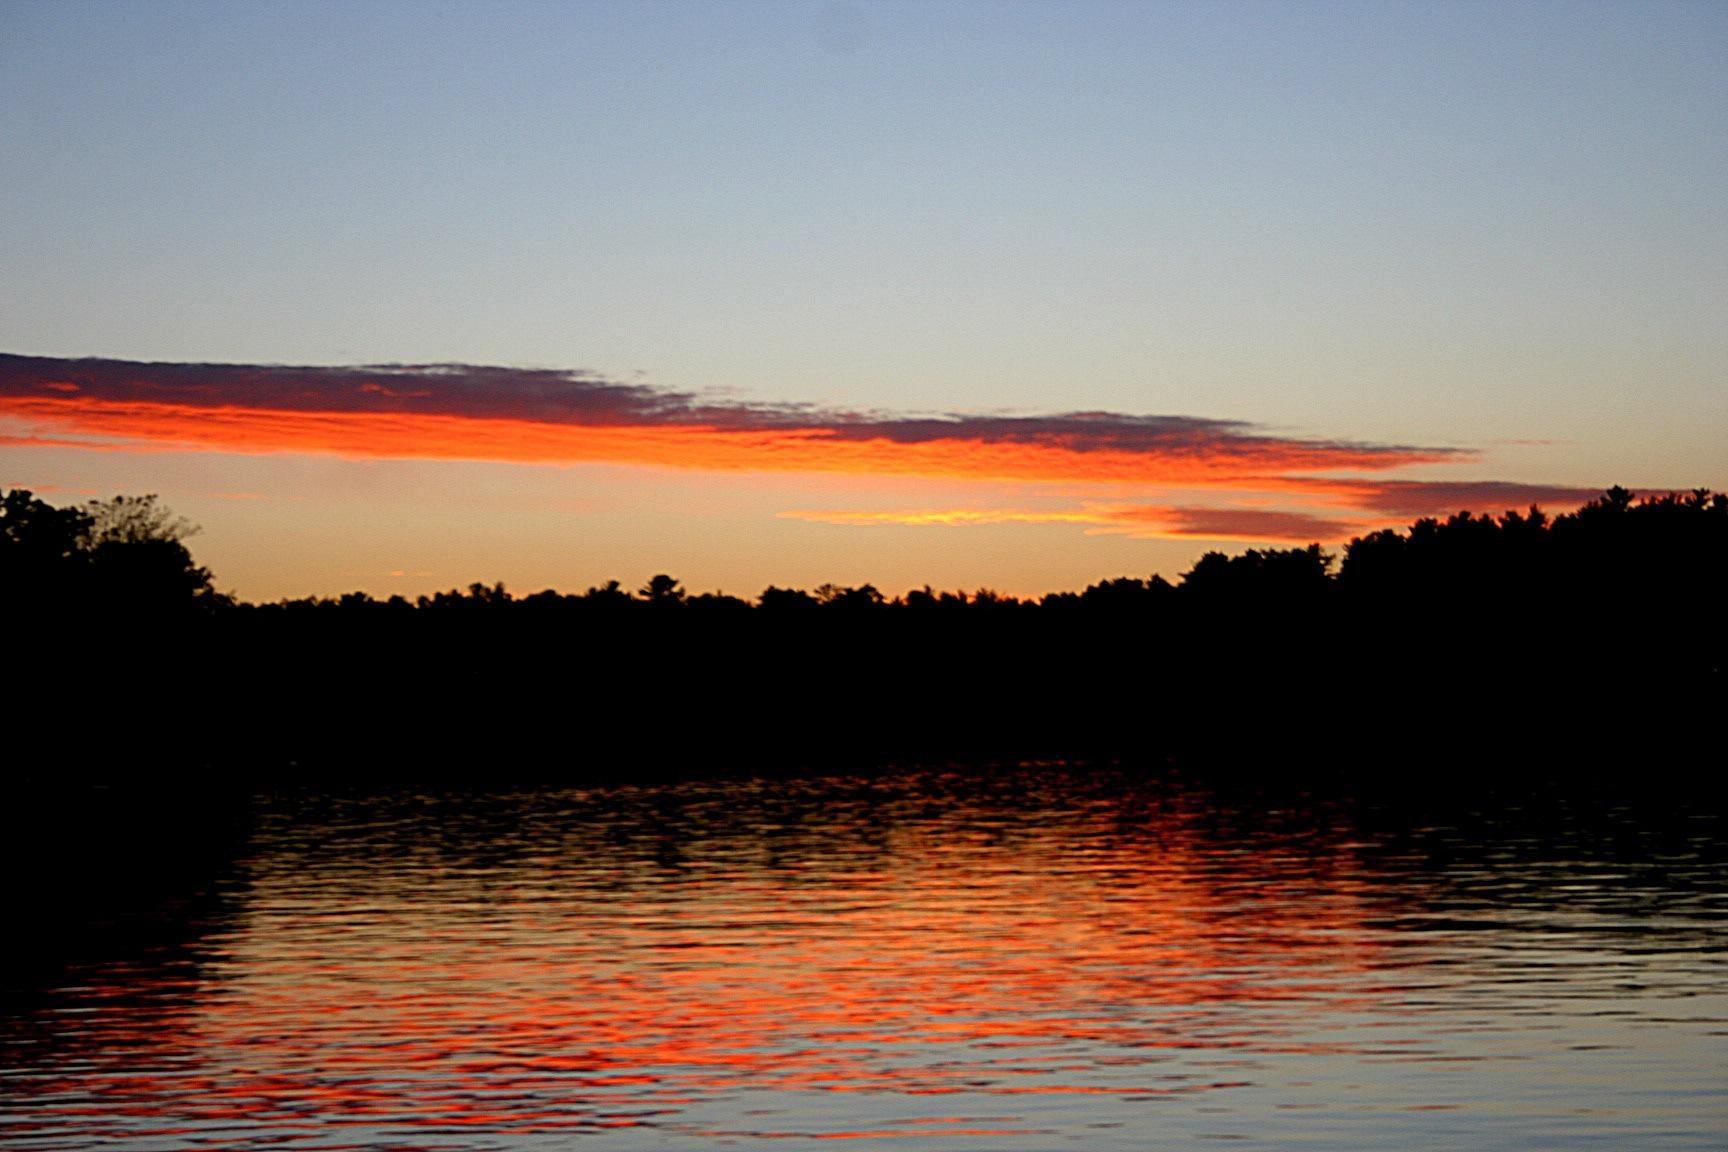 Sunset Little Arbor Vitae WI by joanne.pontiusdavis